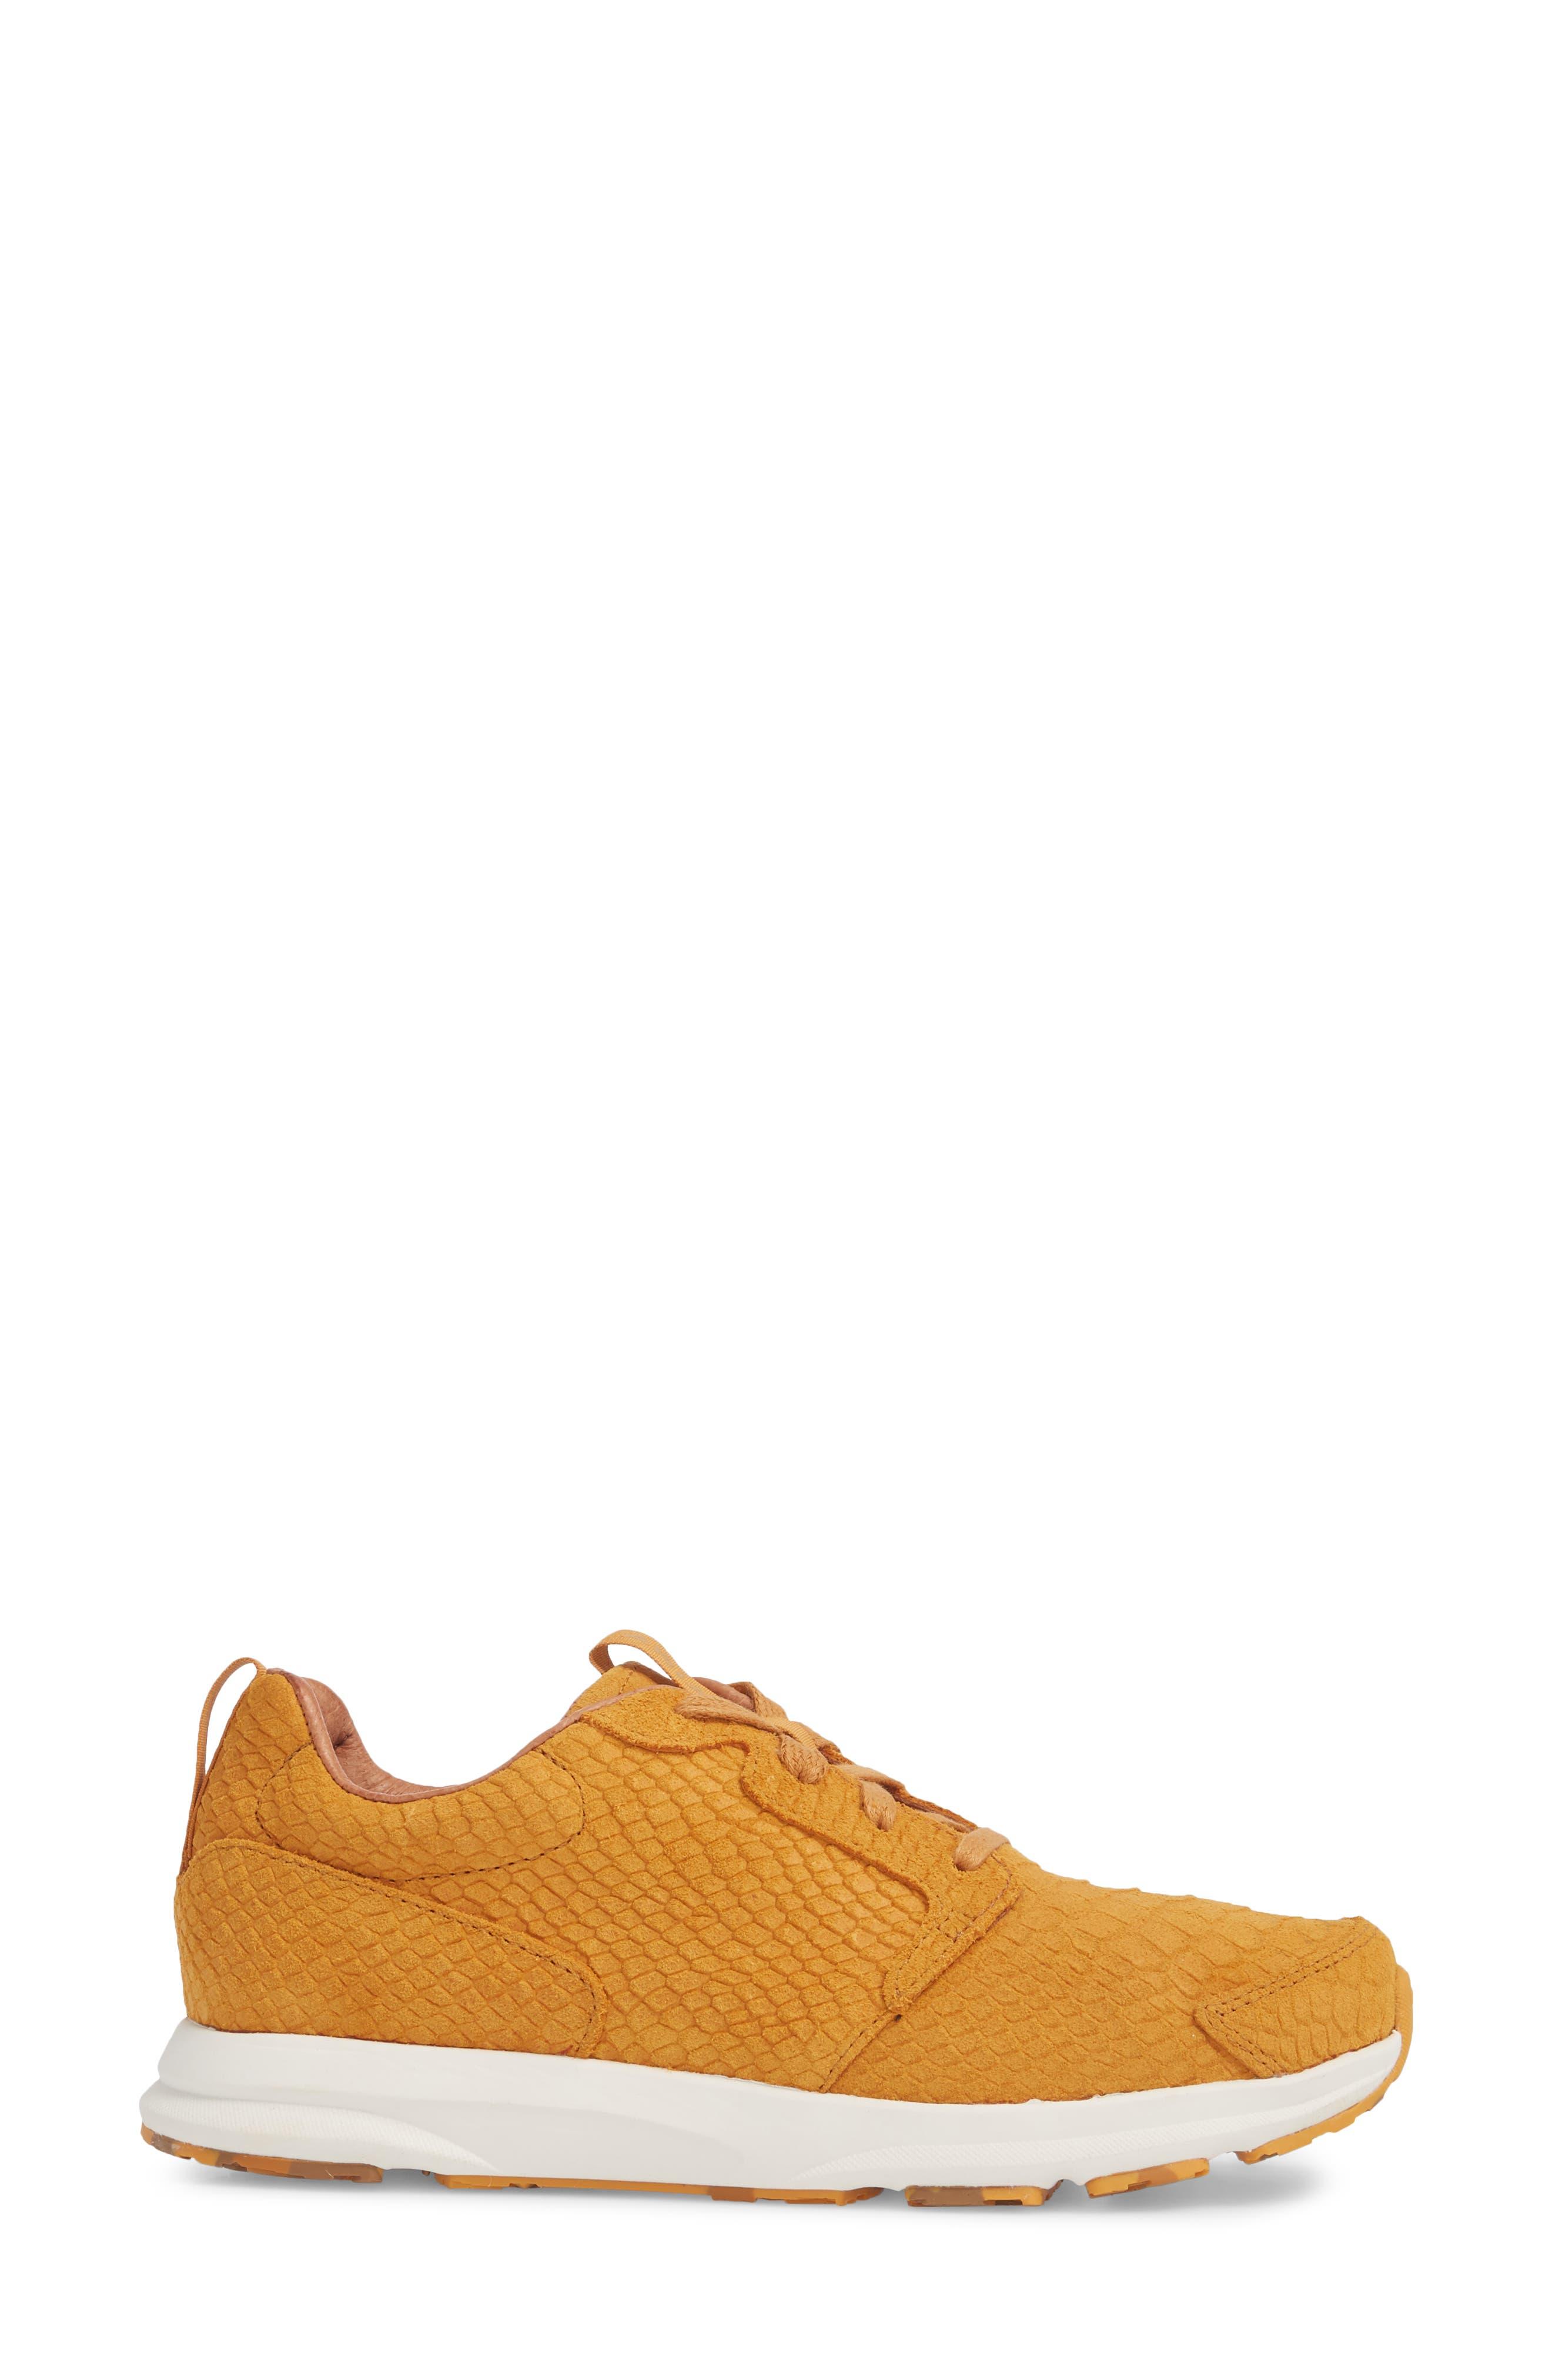 Fusion Sneaker,                             Alternate thumbnail 3, color,                             700